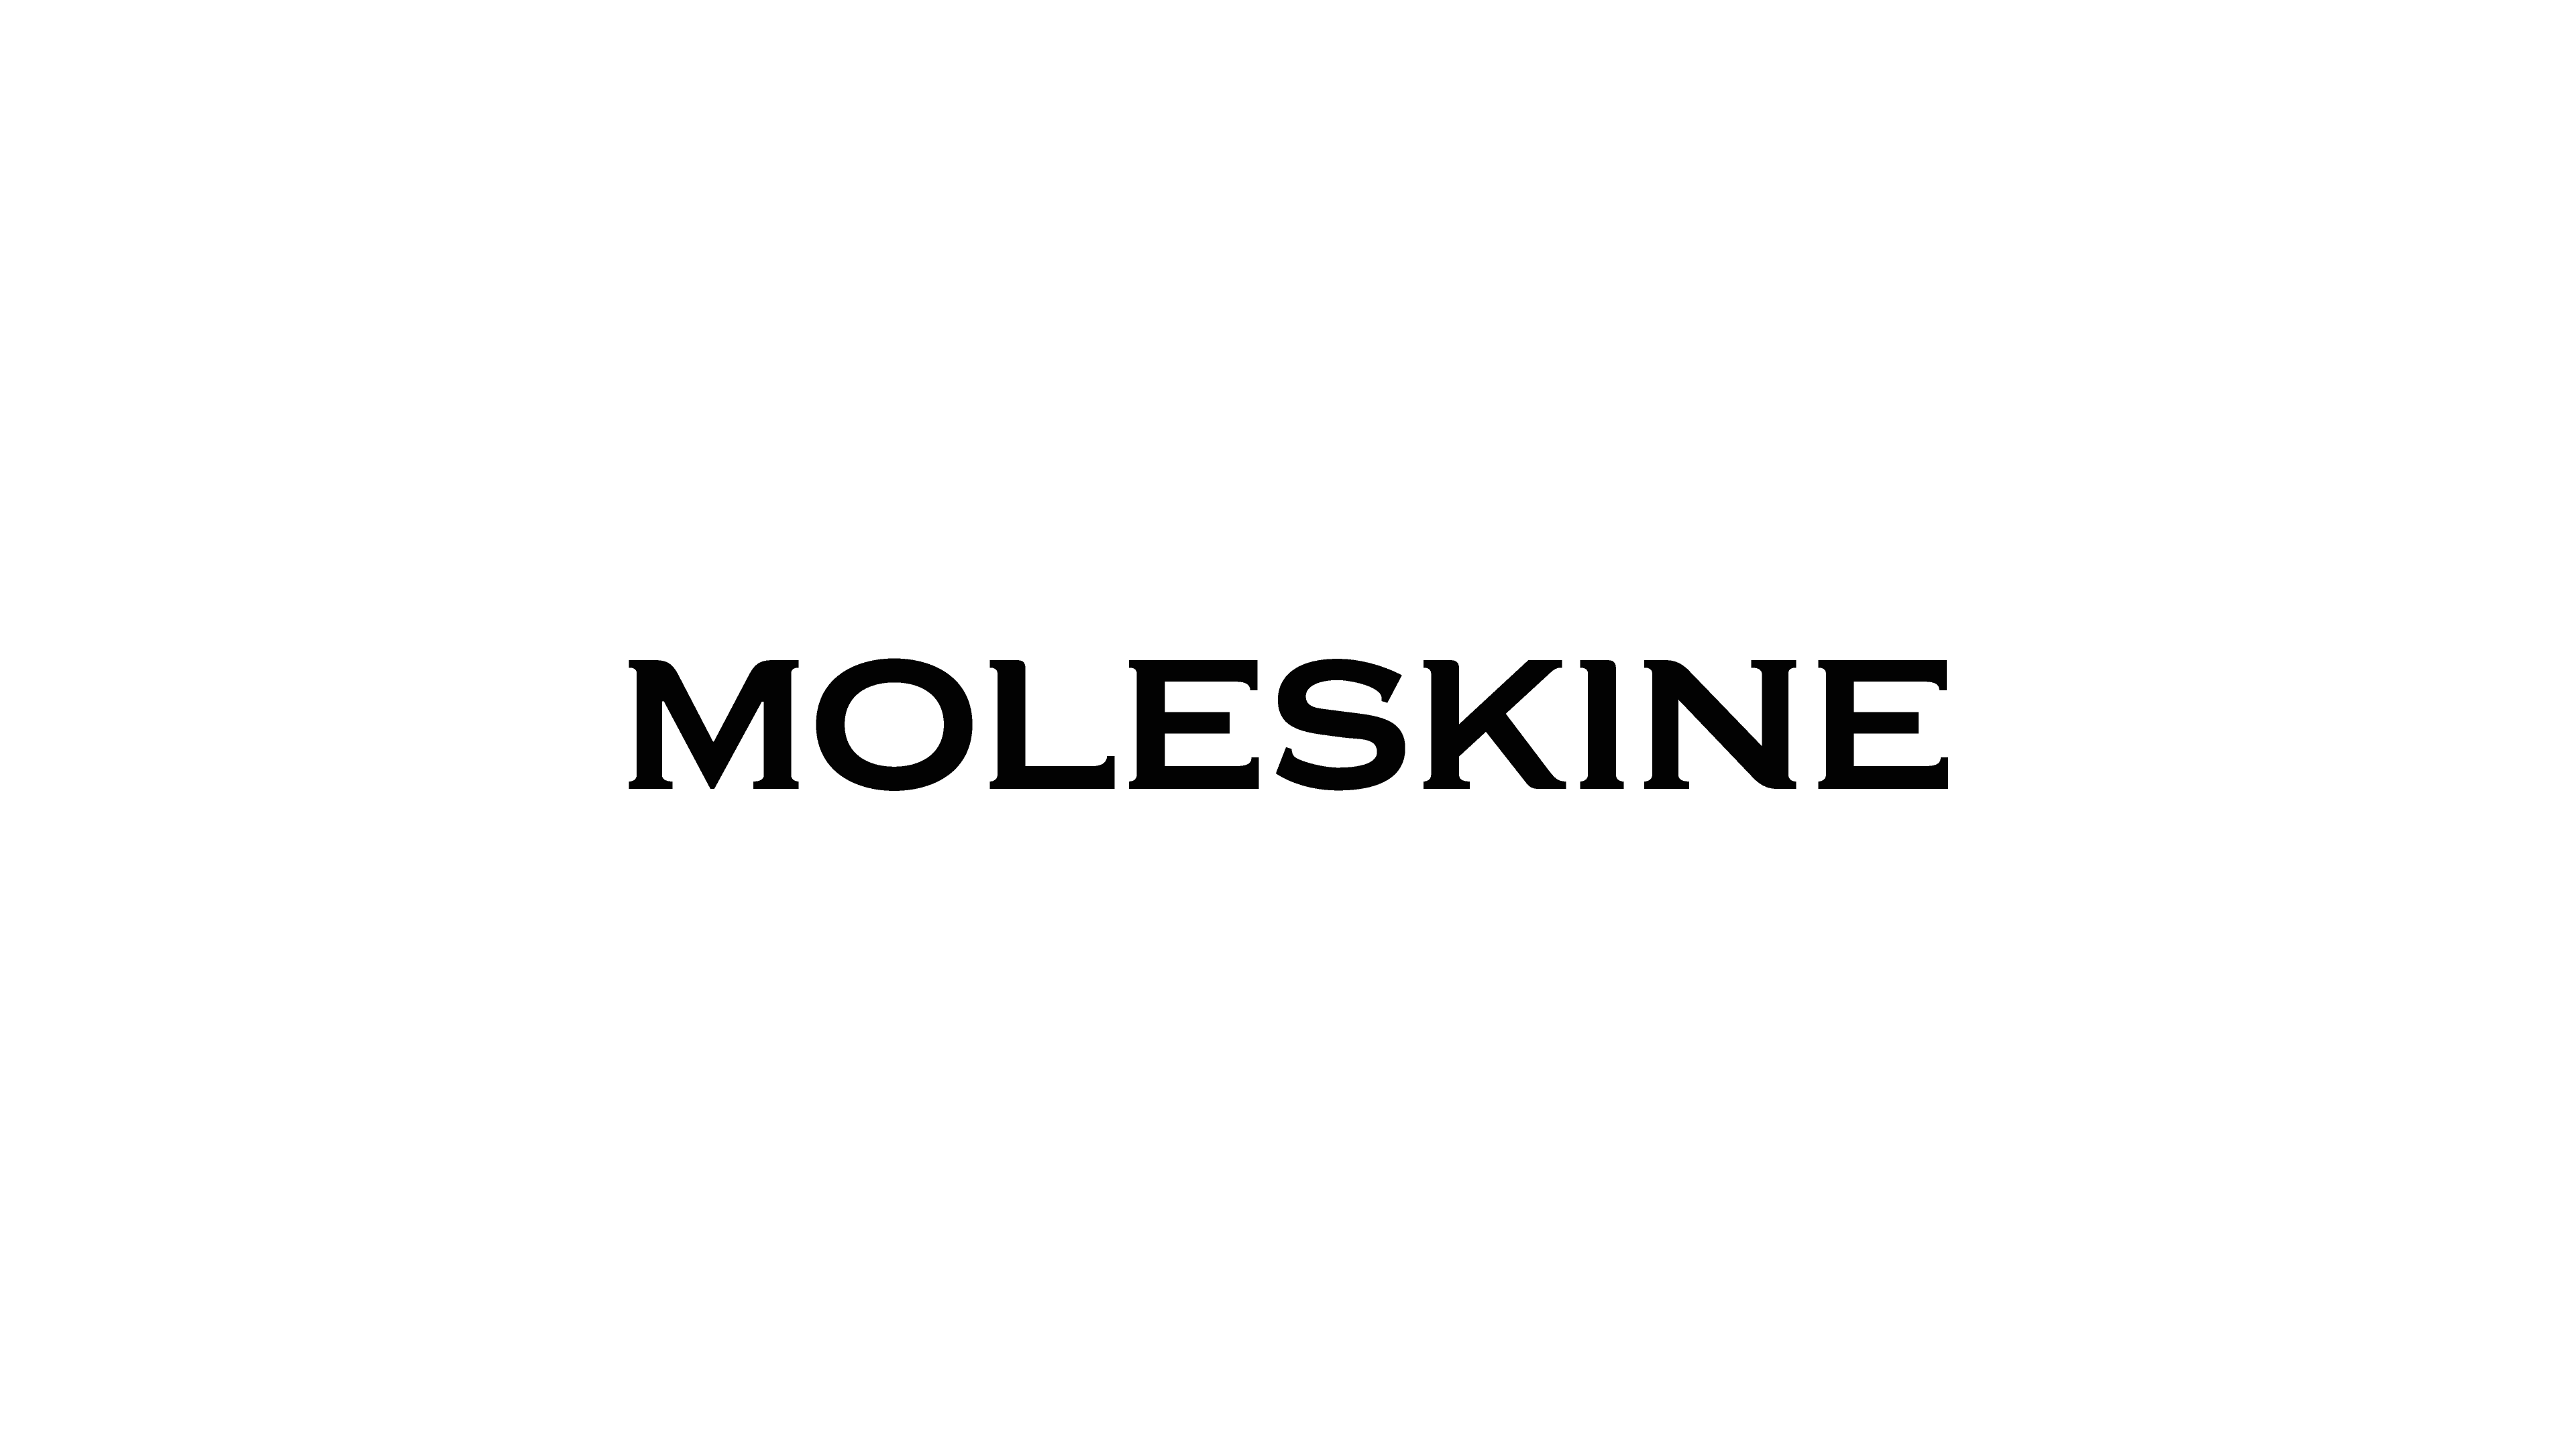 MOLESKINE-brand-identity-01